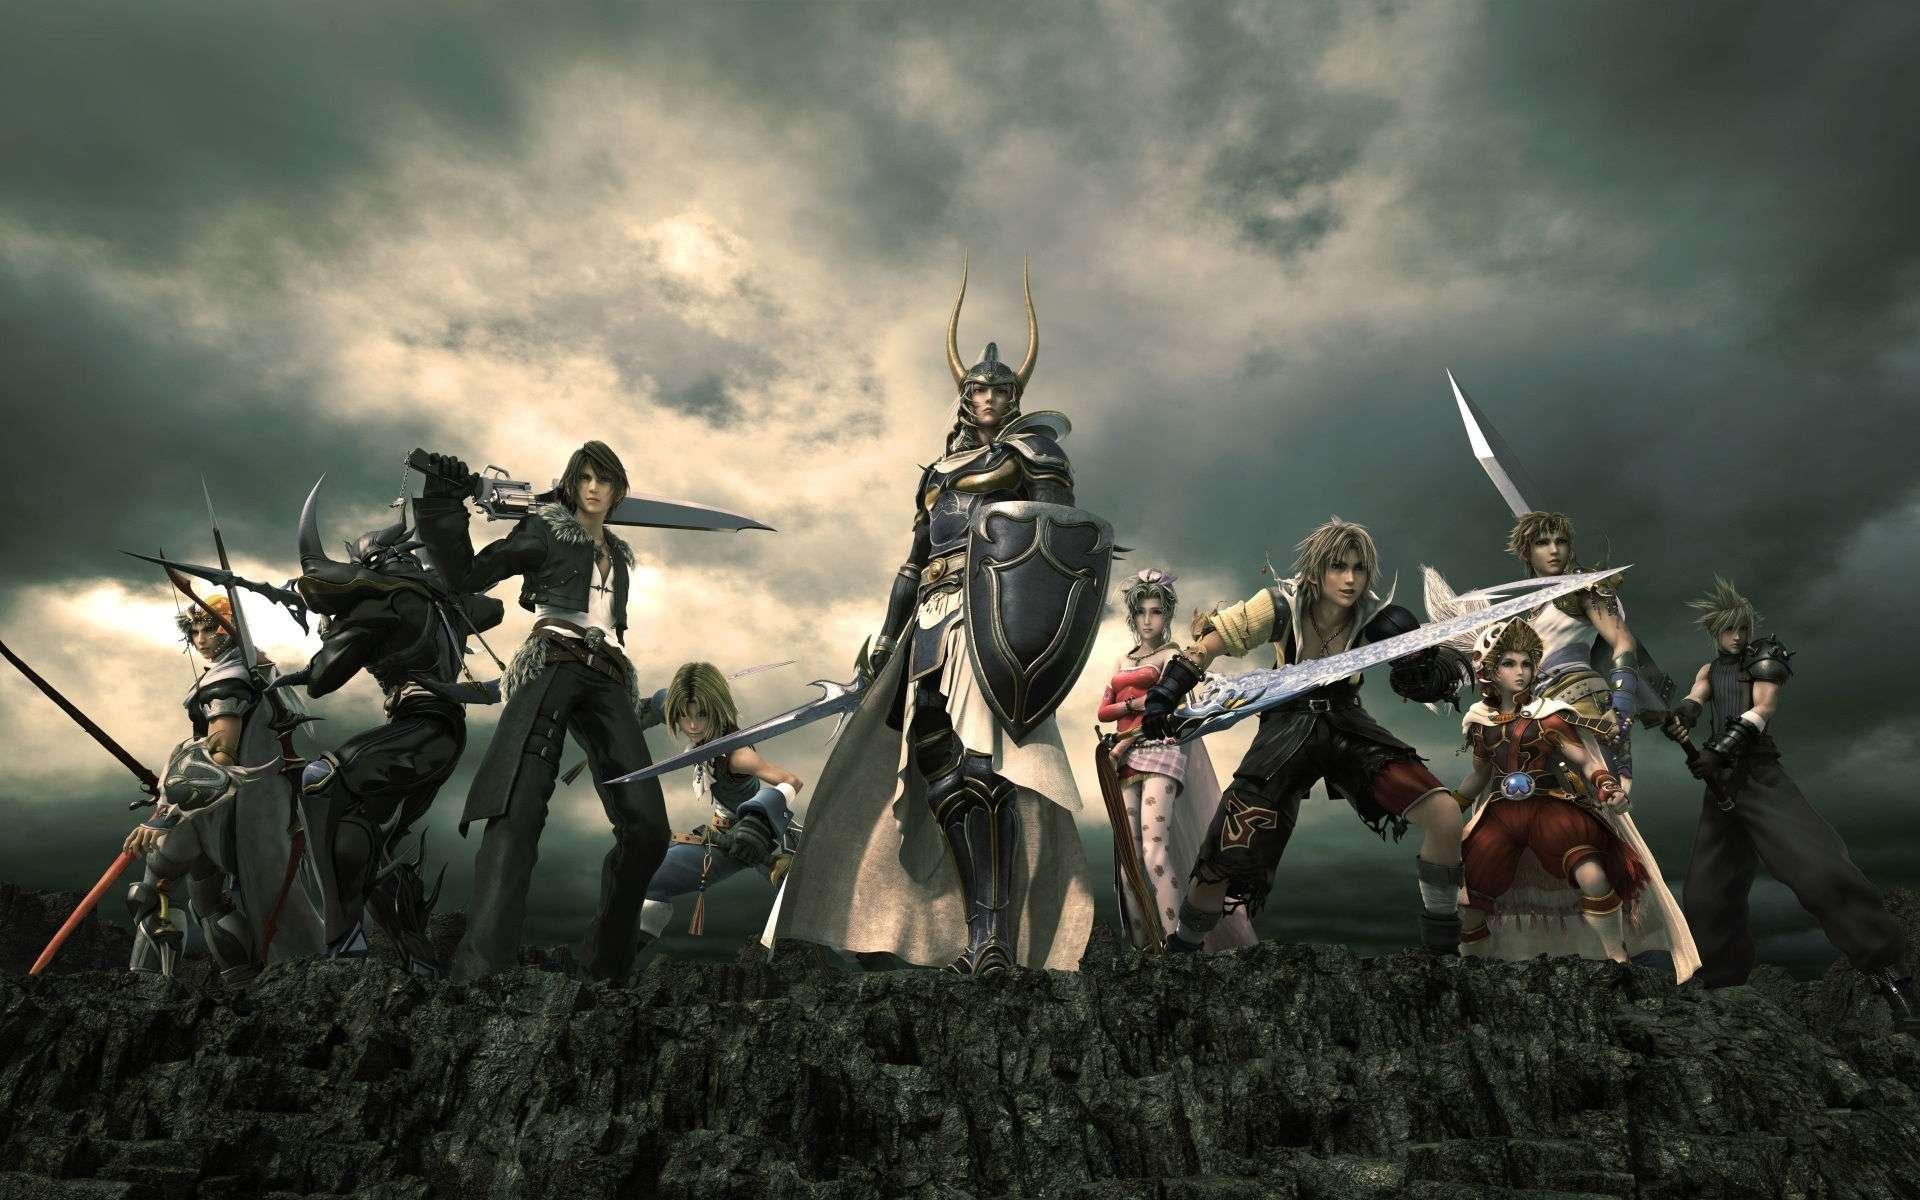 Final Fantasy Video Game Wallpaper 011